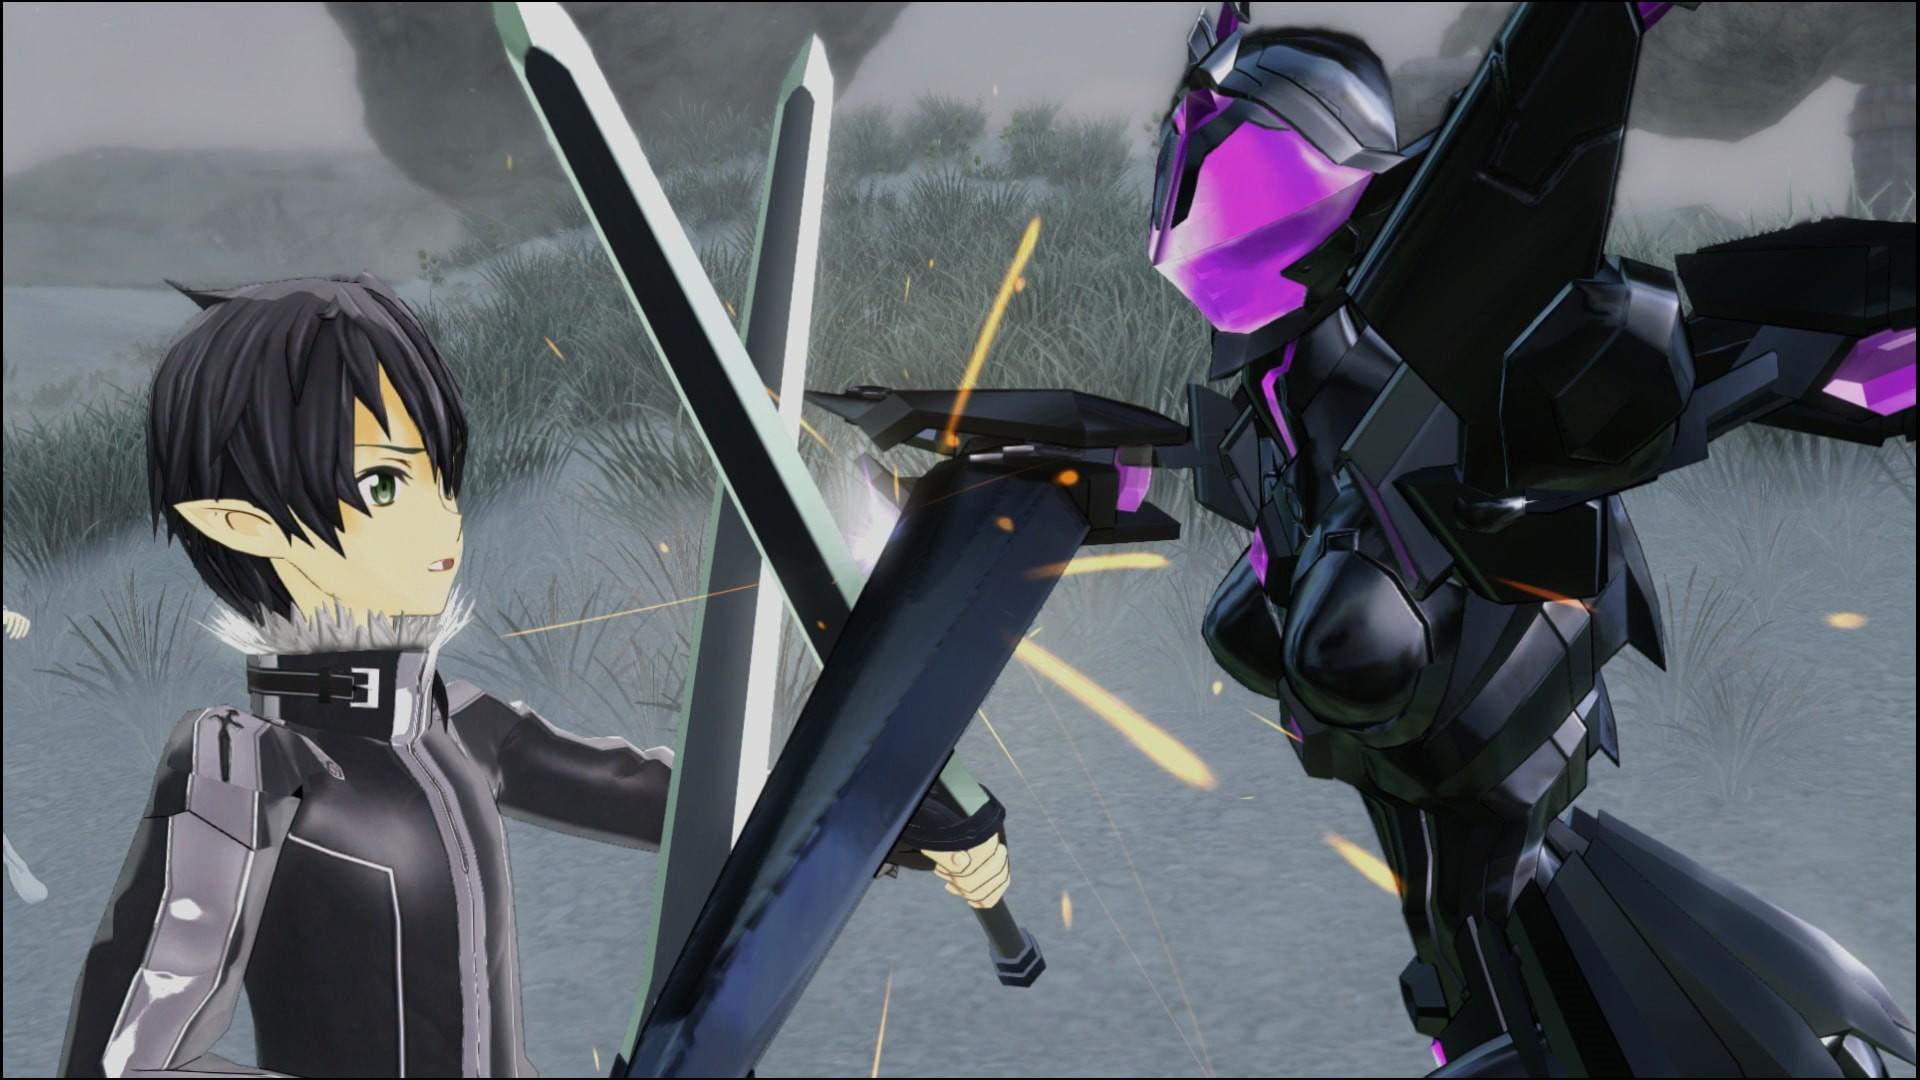 Accel World vs Sword Art Online Screenshots and Artwork